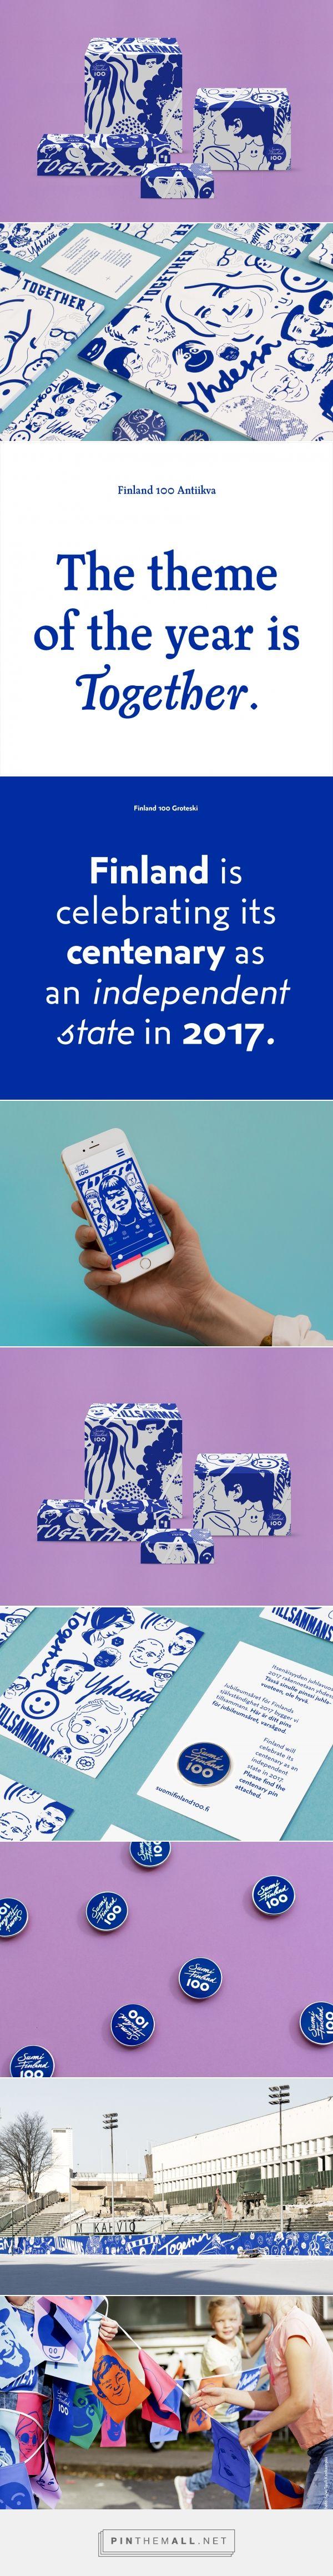 New Brand Identity for Finland 100 by Kokoro & Moi — BP&O - created via https://pinthemall.net